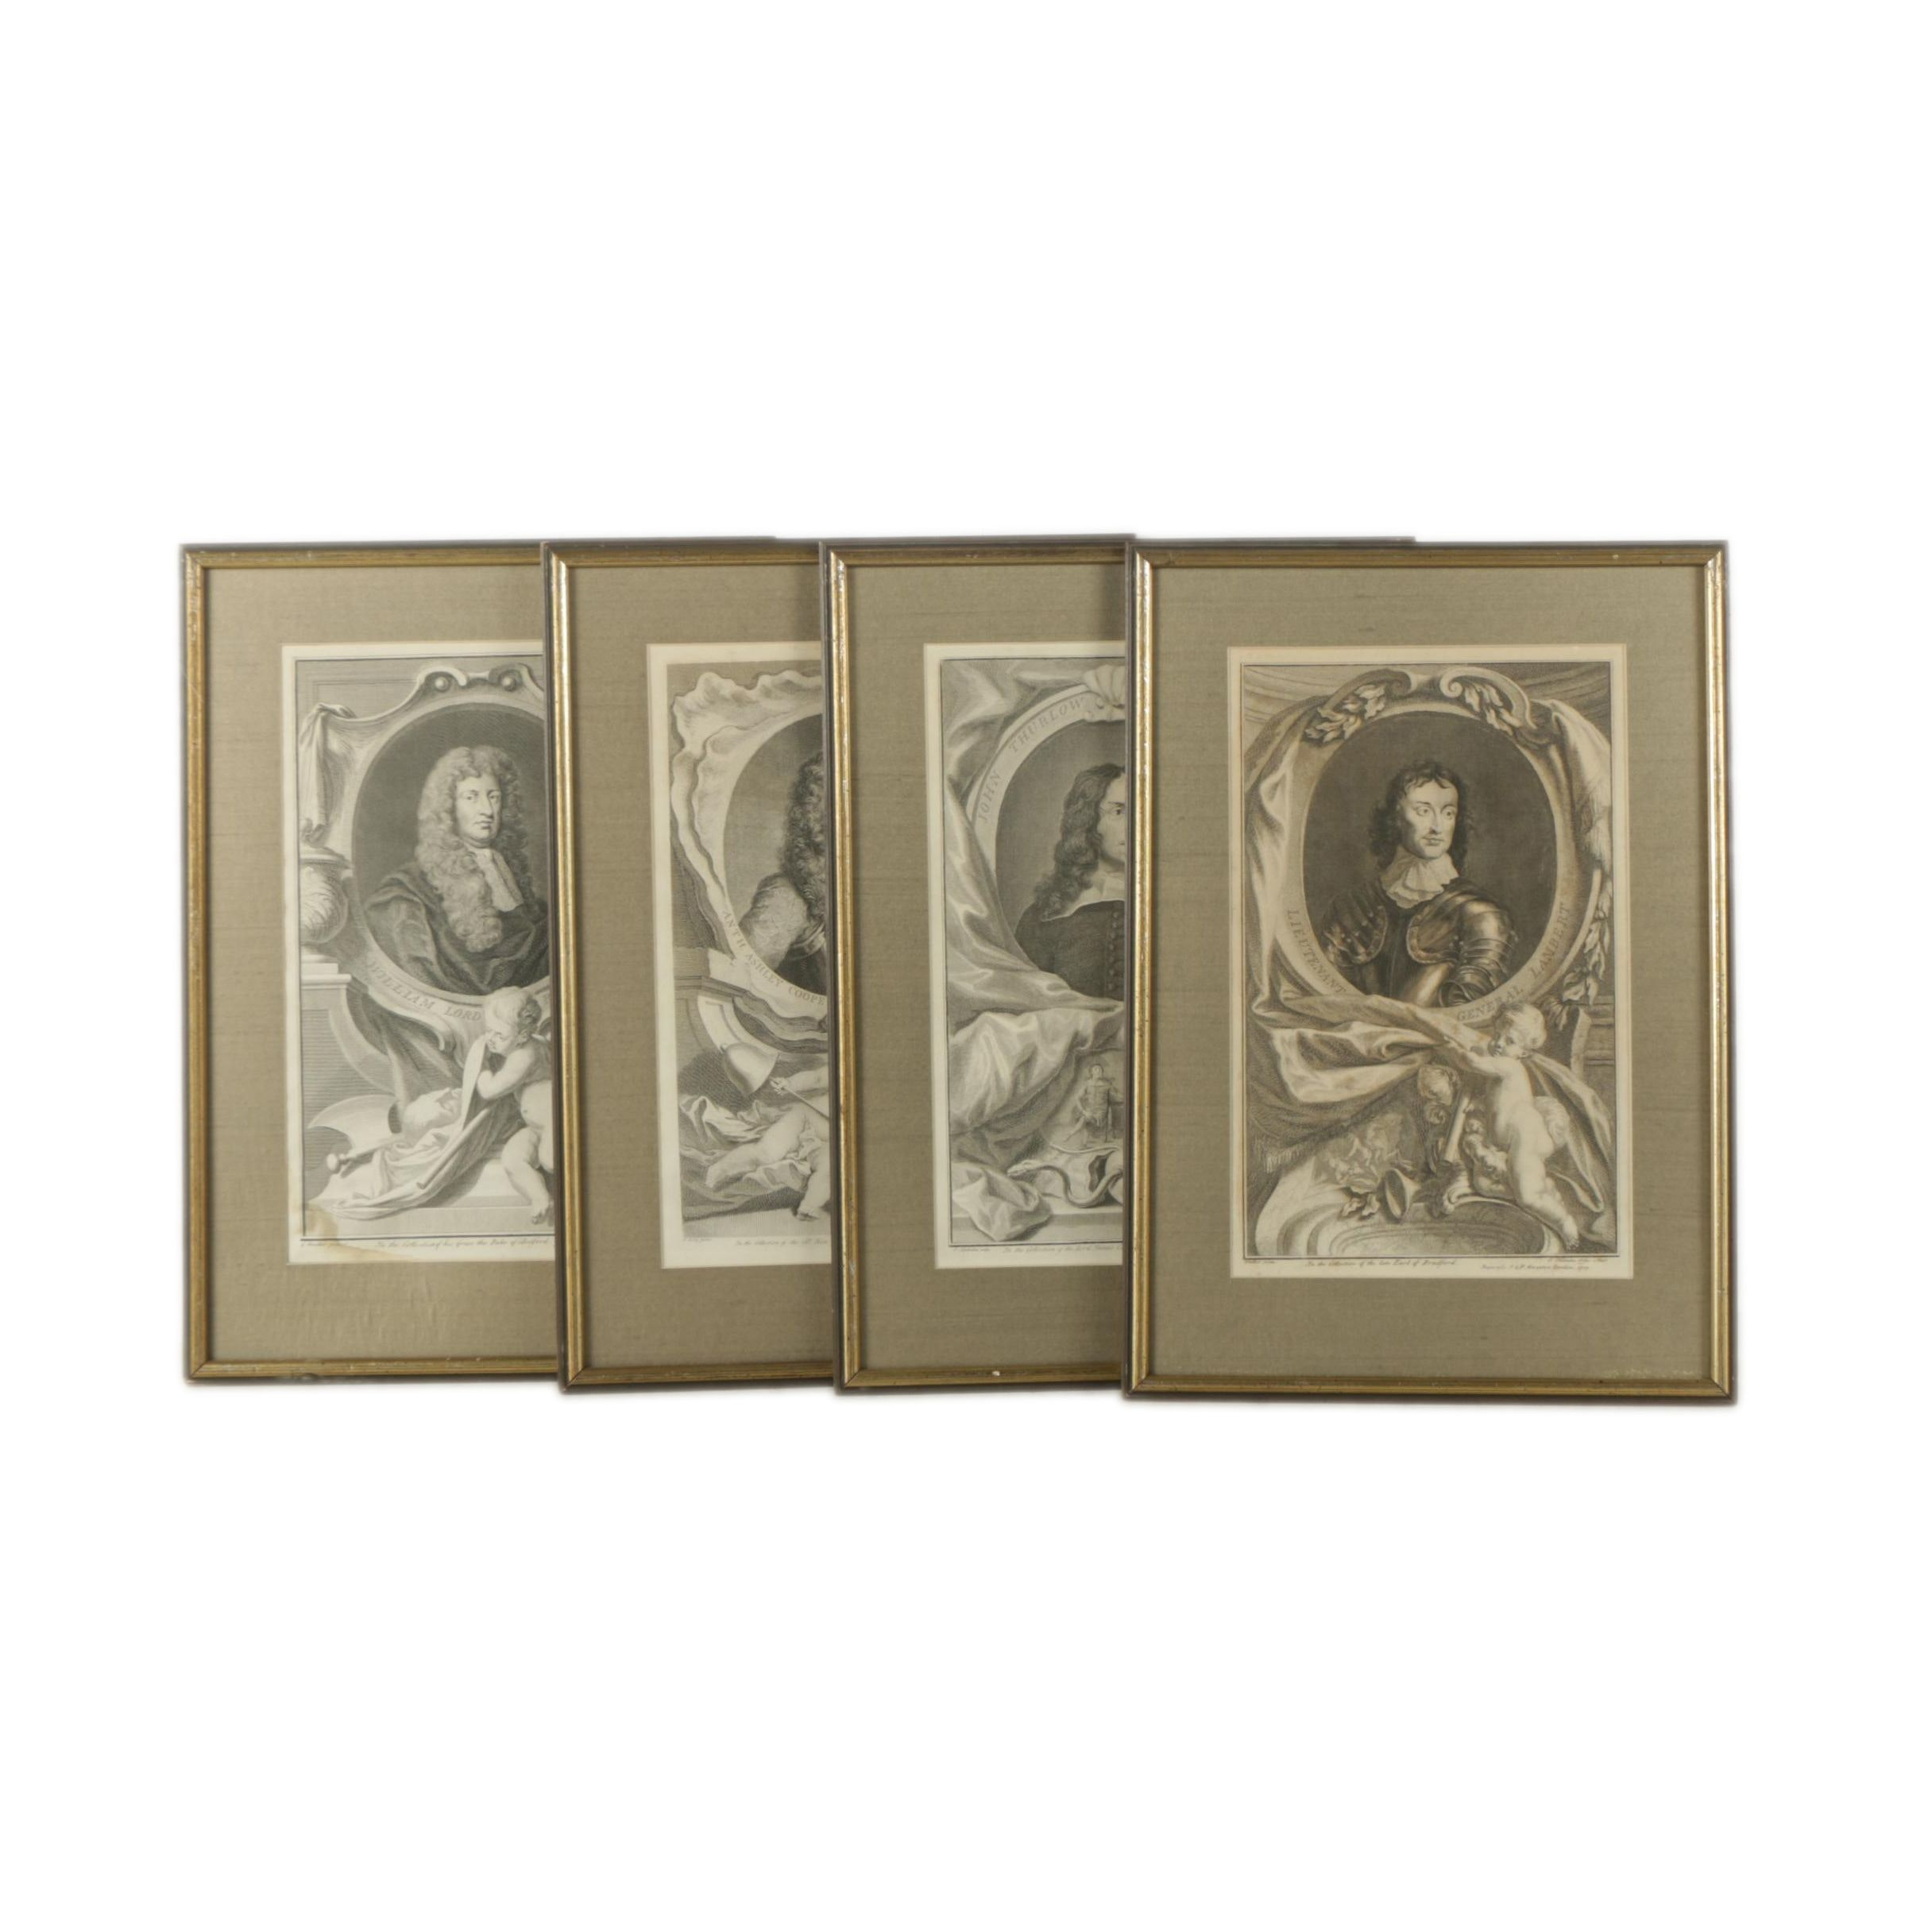 Antique Intaglio Prints of Notable 17th-Century Figures After Jacobus Houbraken